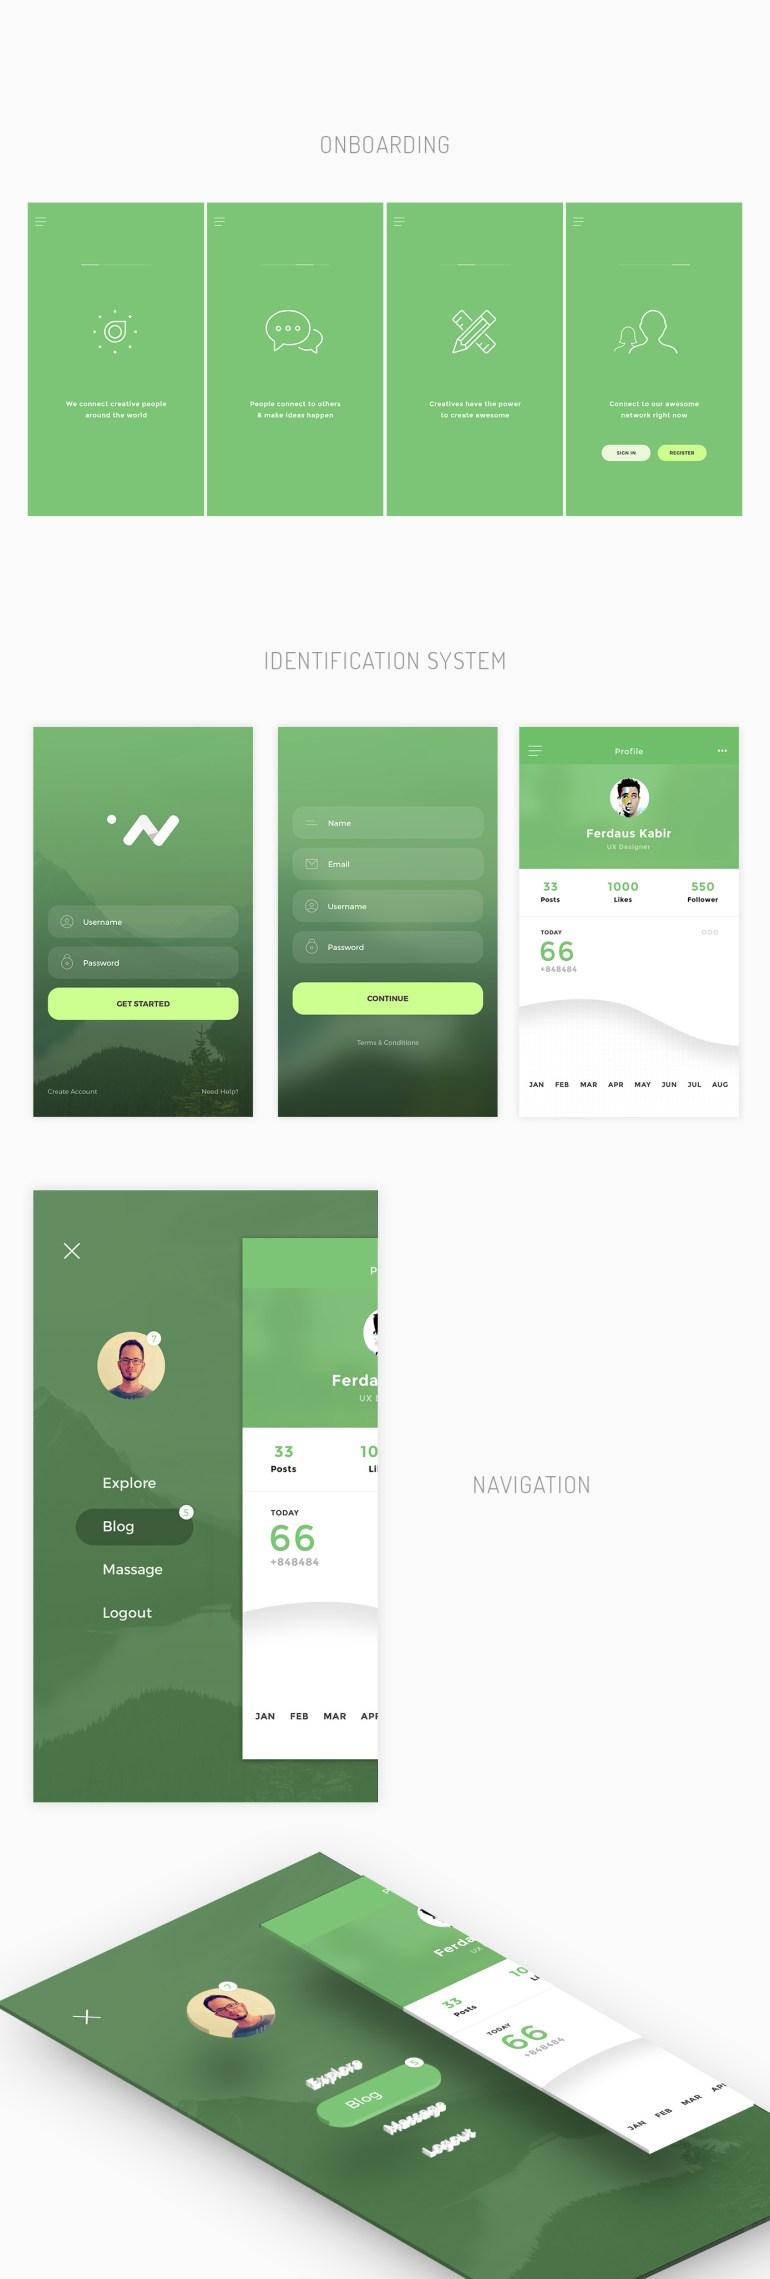 free-psd-mobile-app-ui